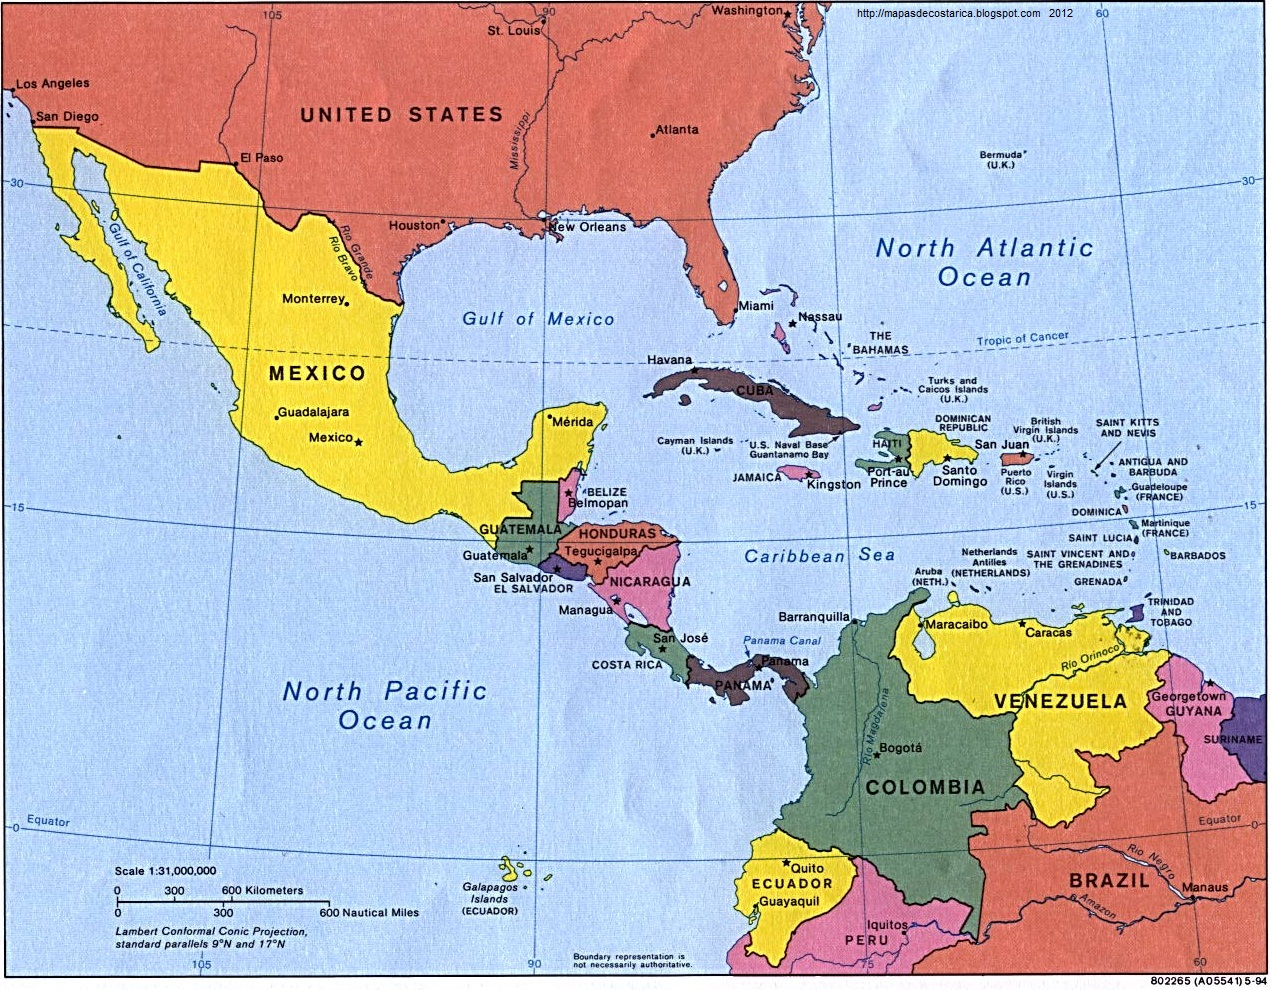 Mapa De Centro America.Mapa De Centro Y Sudamerica Jasonkellyphoto Co